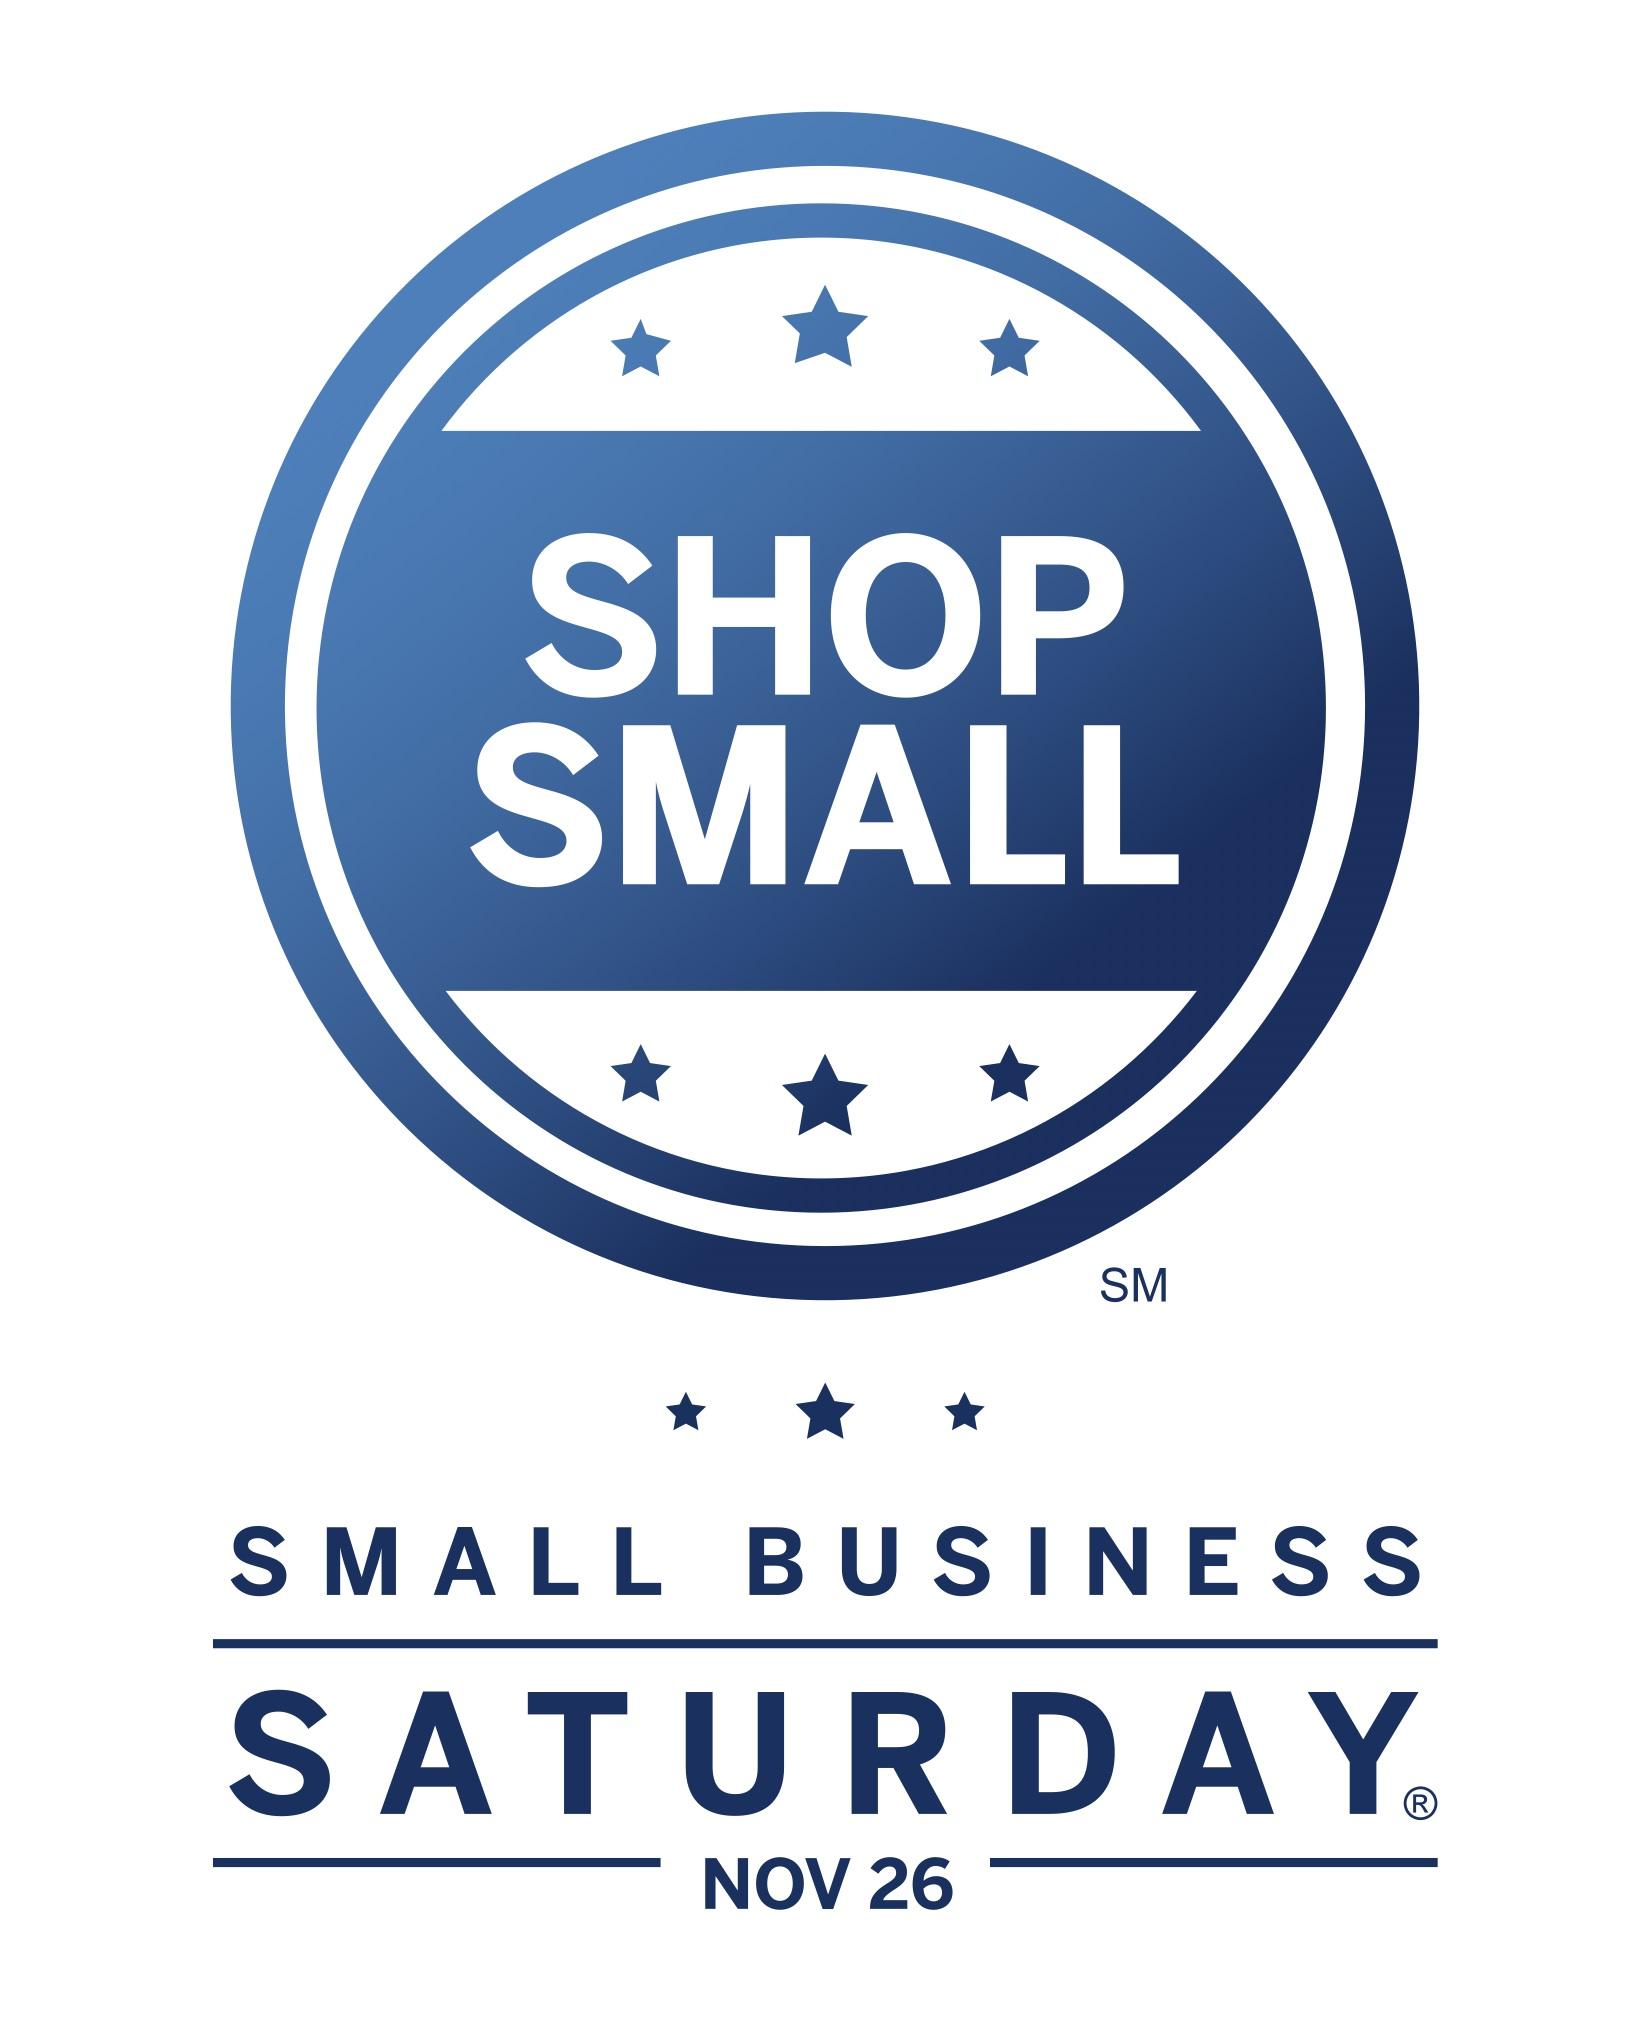 SBS ShopSmall Logo